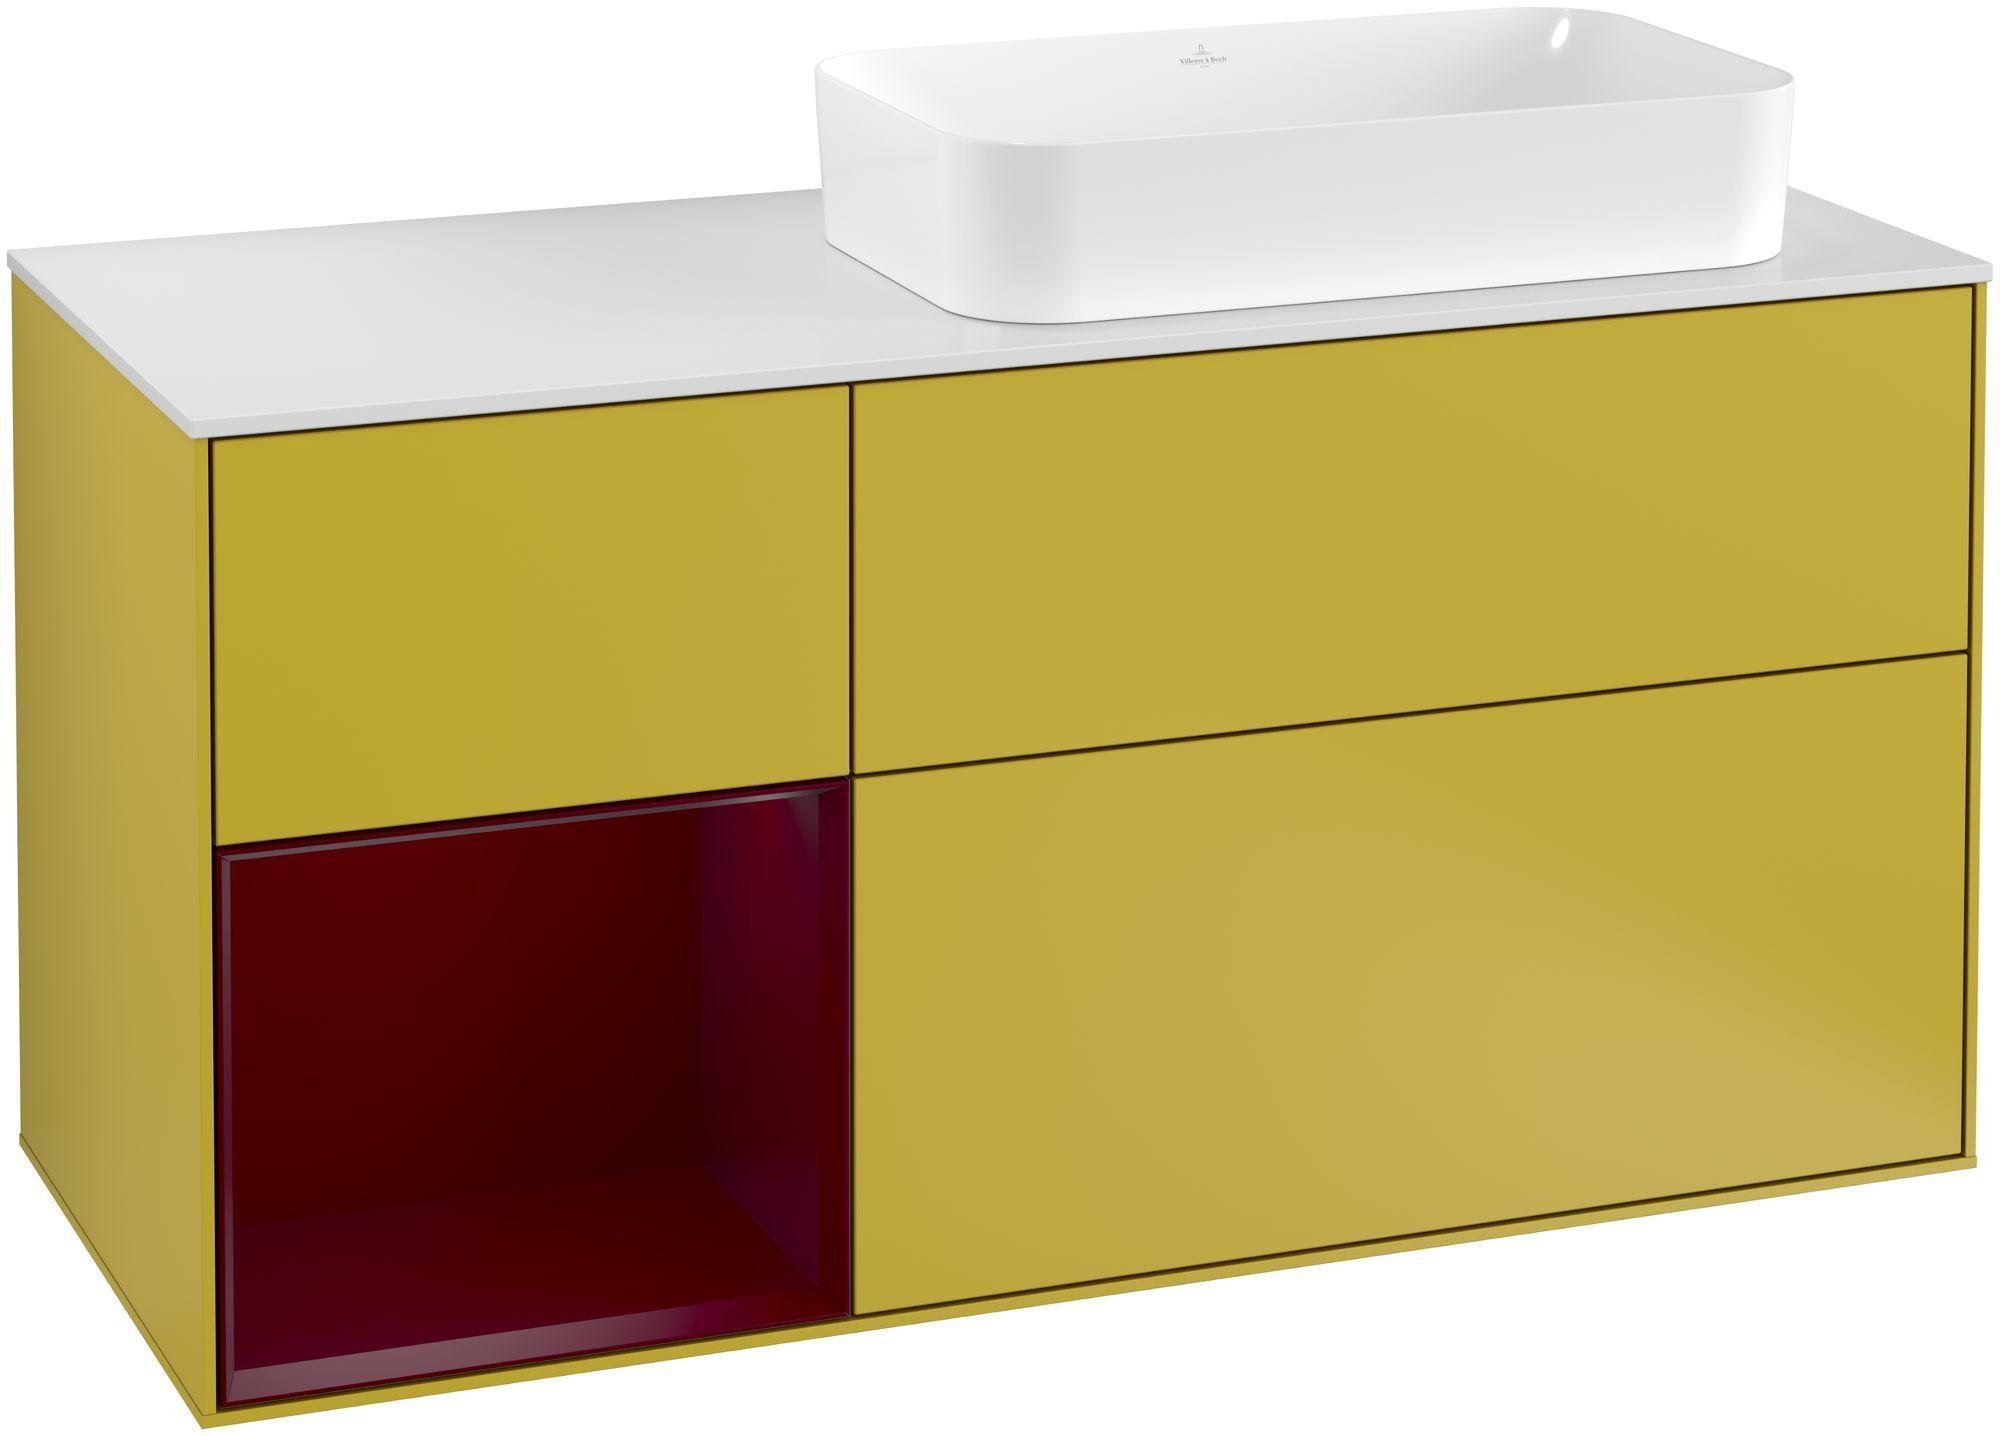 Villeroy & Boch Finion G27 Waschtischunterschrank mit Regalelement 3 Auszüge Waschtisch rechts LED-Beleuchtung B:120xH:60,3xT:50,1cm Front, Korpus: Sun, Regal: Peony, Glasplatte: White Matt G271HBHE